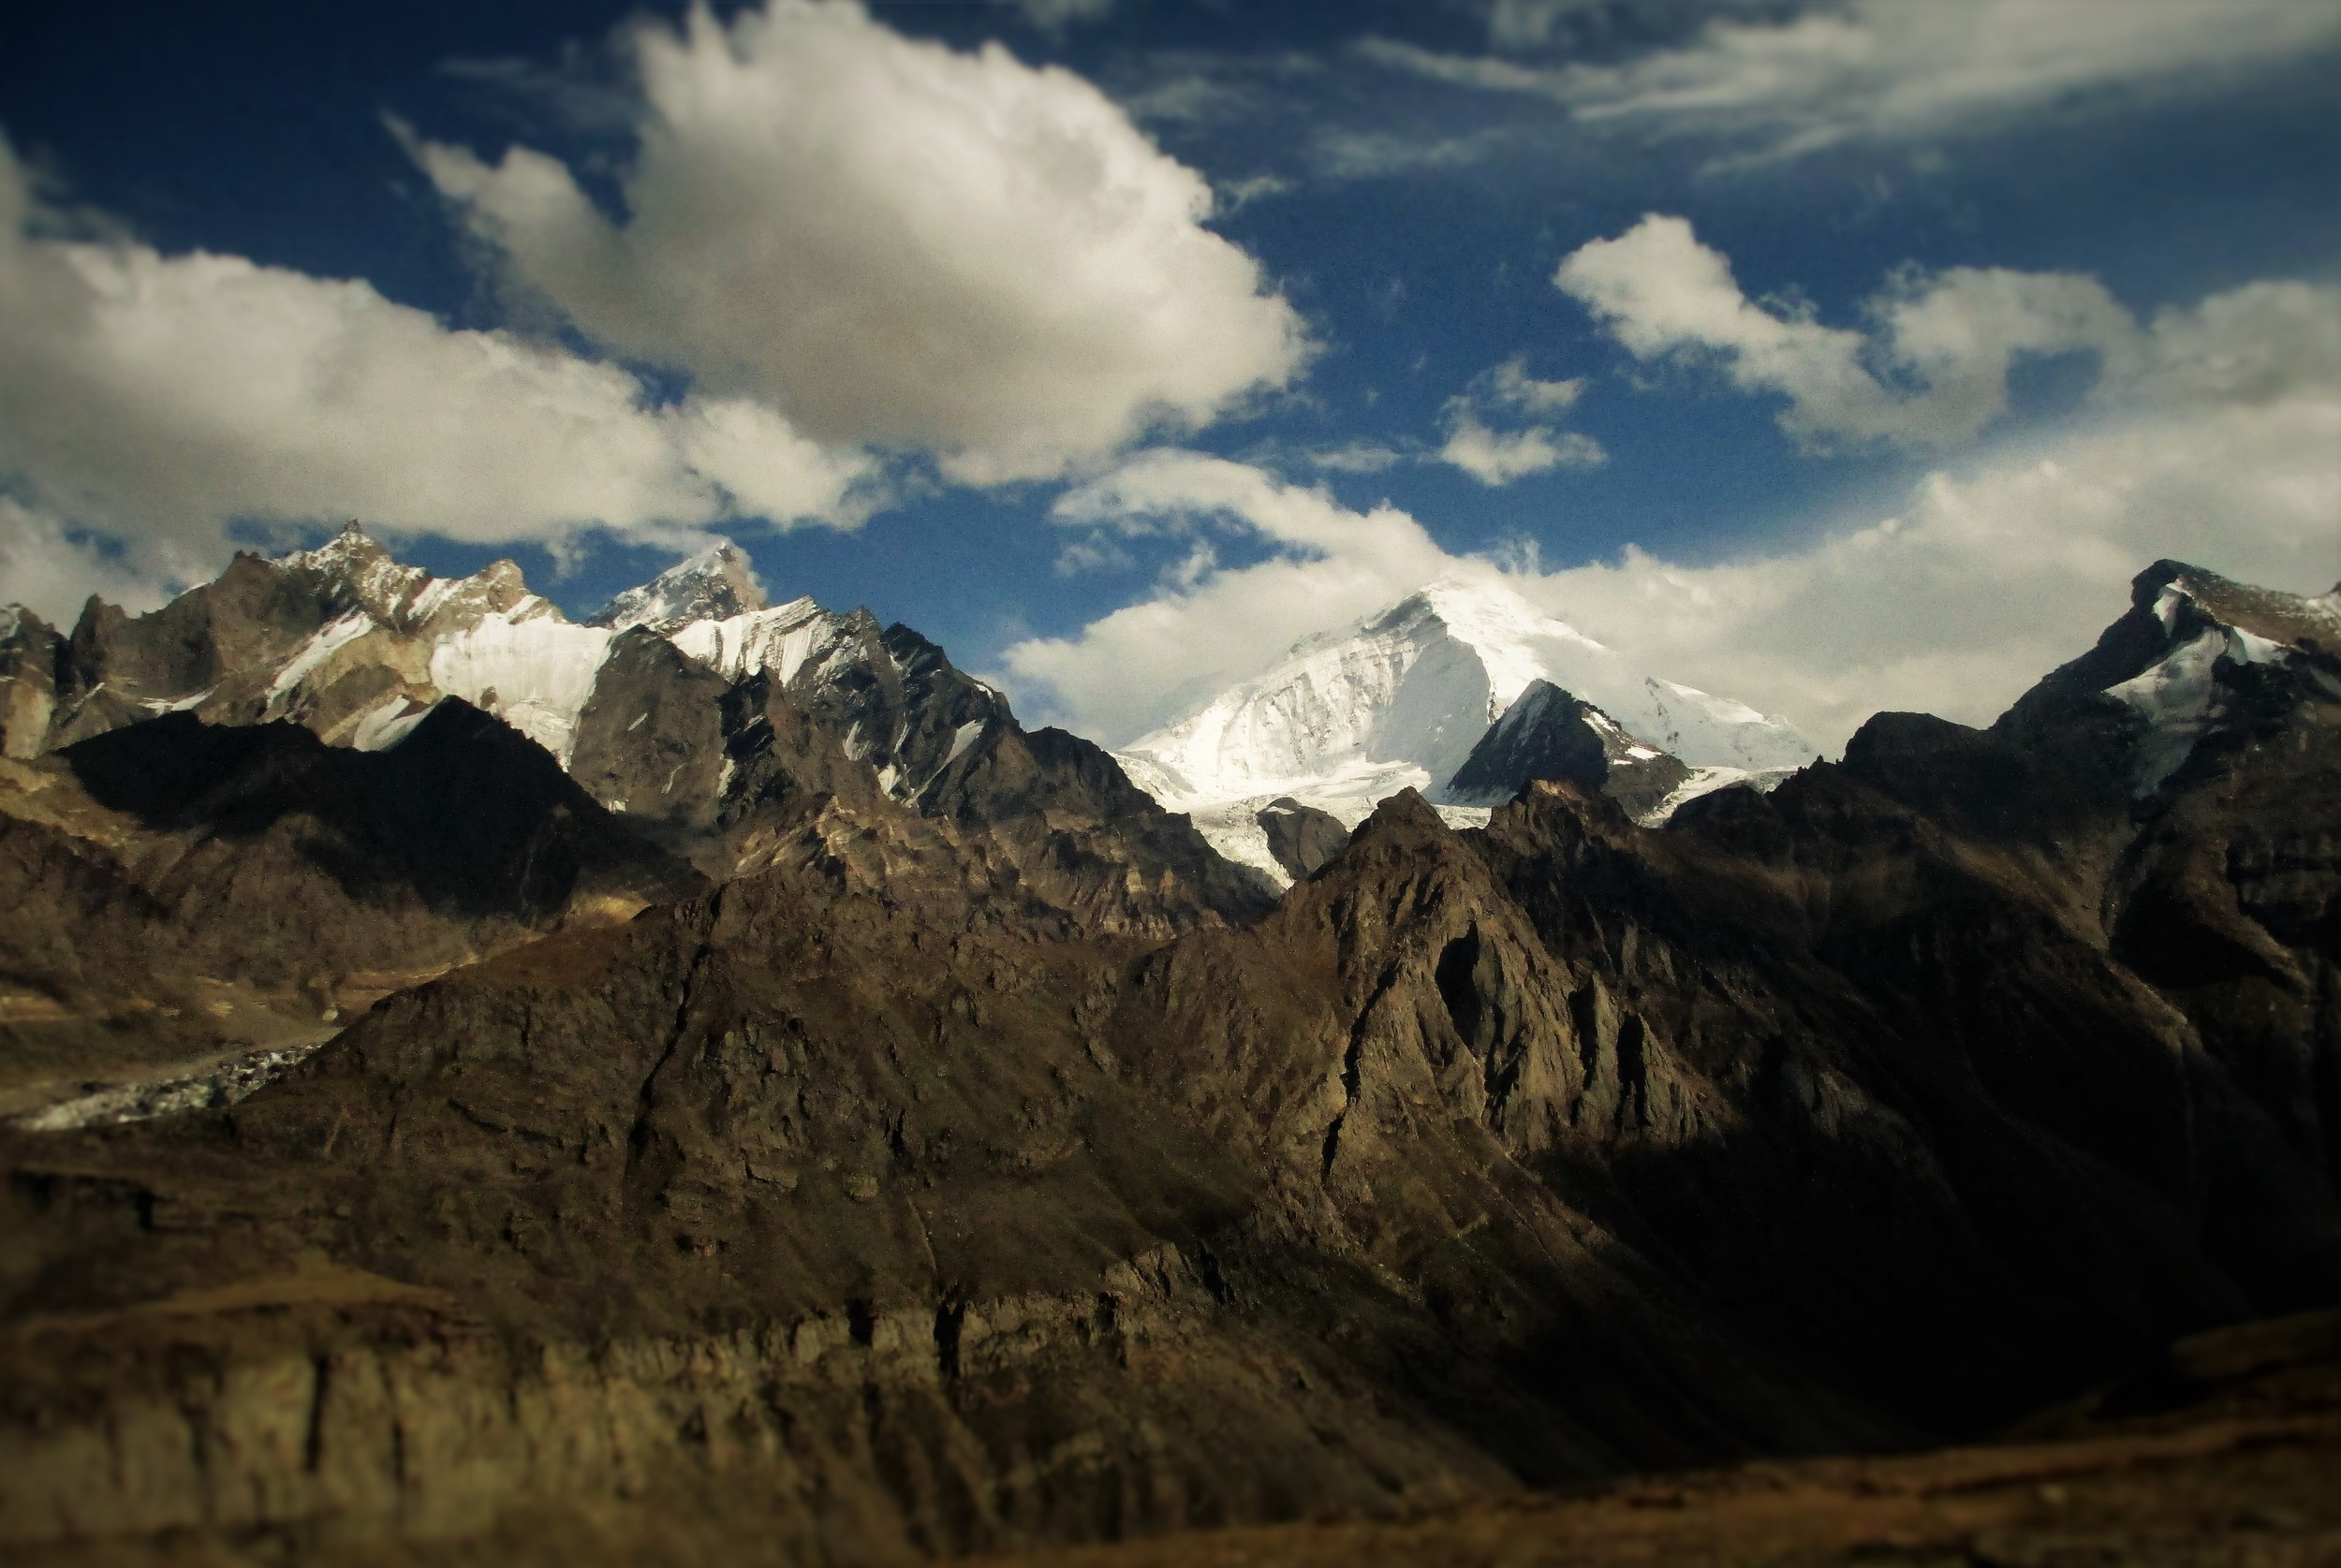 the Zanskar mountains of the Great Himalayas, Kun and Nun behind.